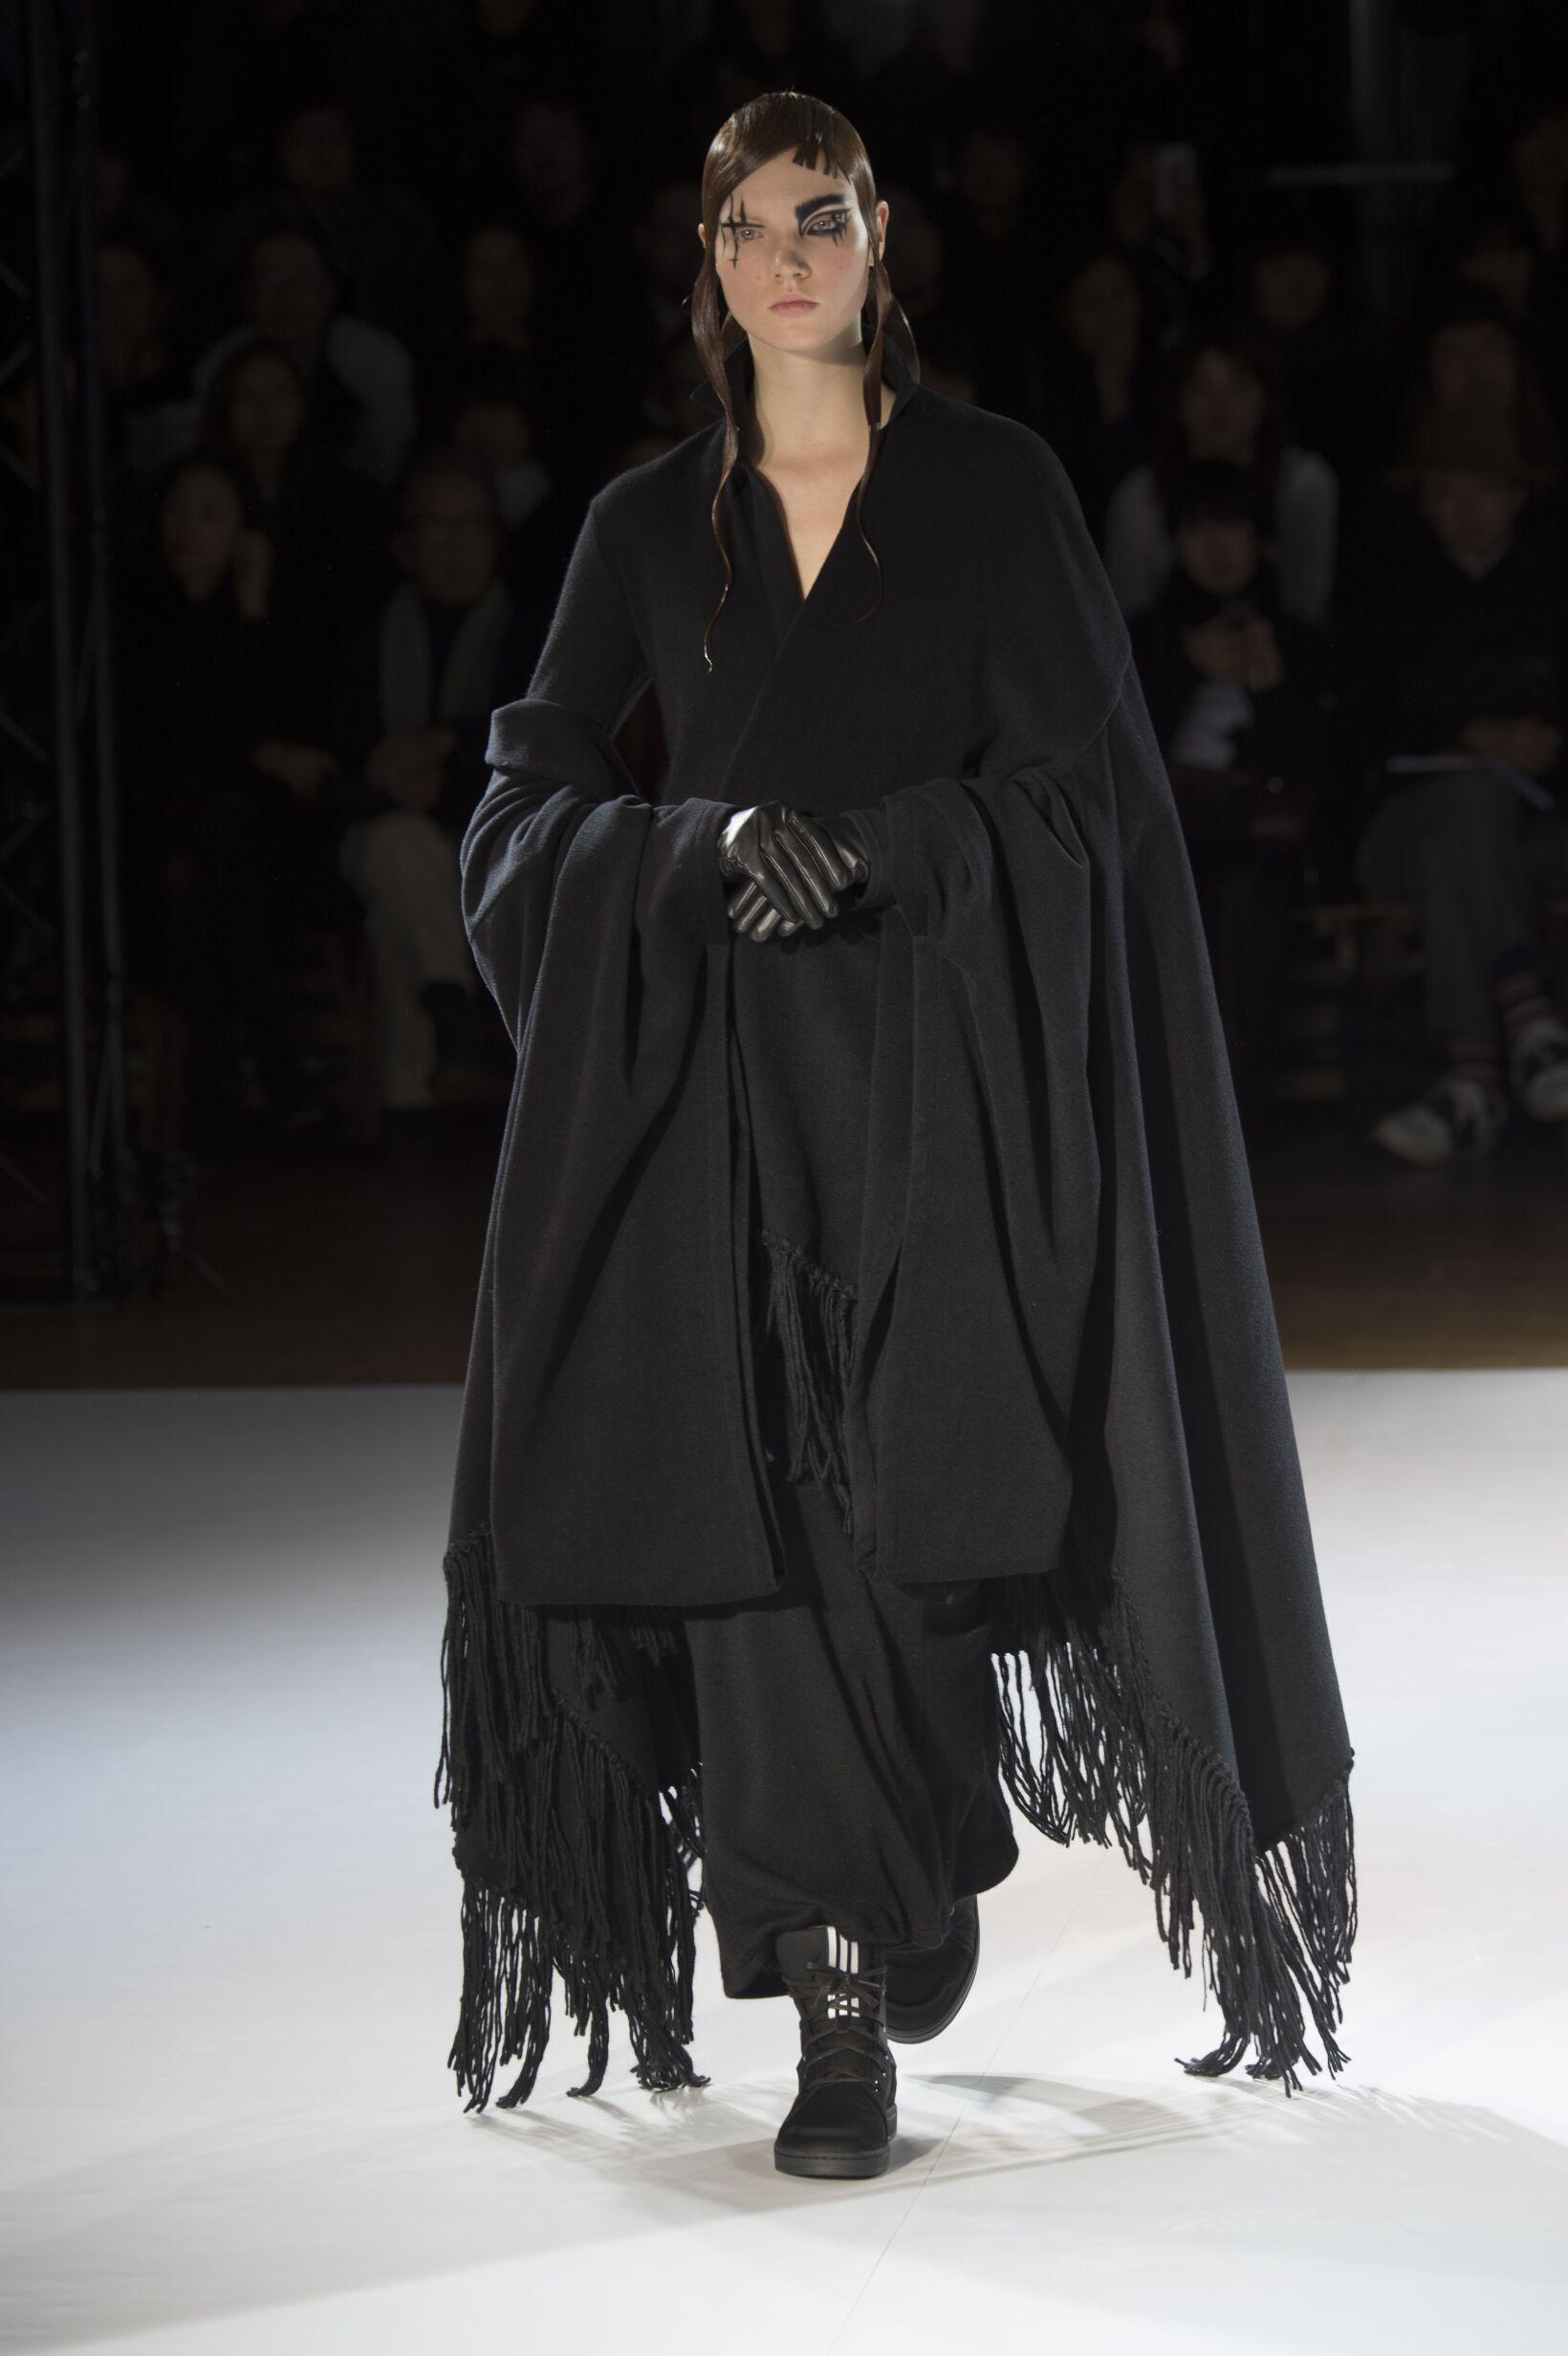 Yohji Yamamoto Fall Winter 2015 16 Women's Collection Paris Fashion Week